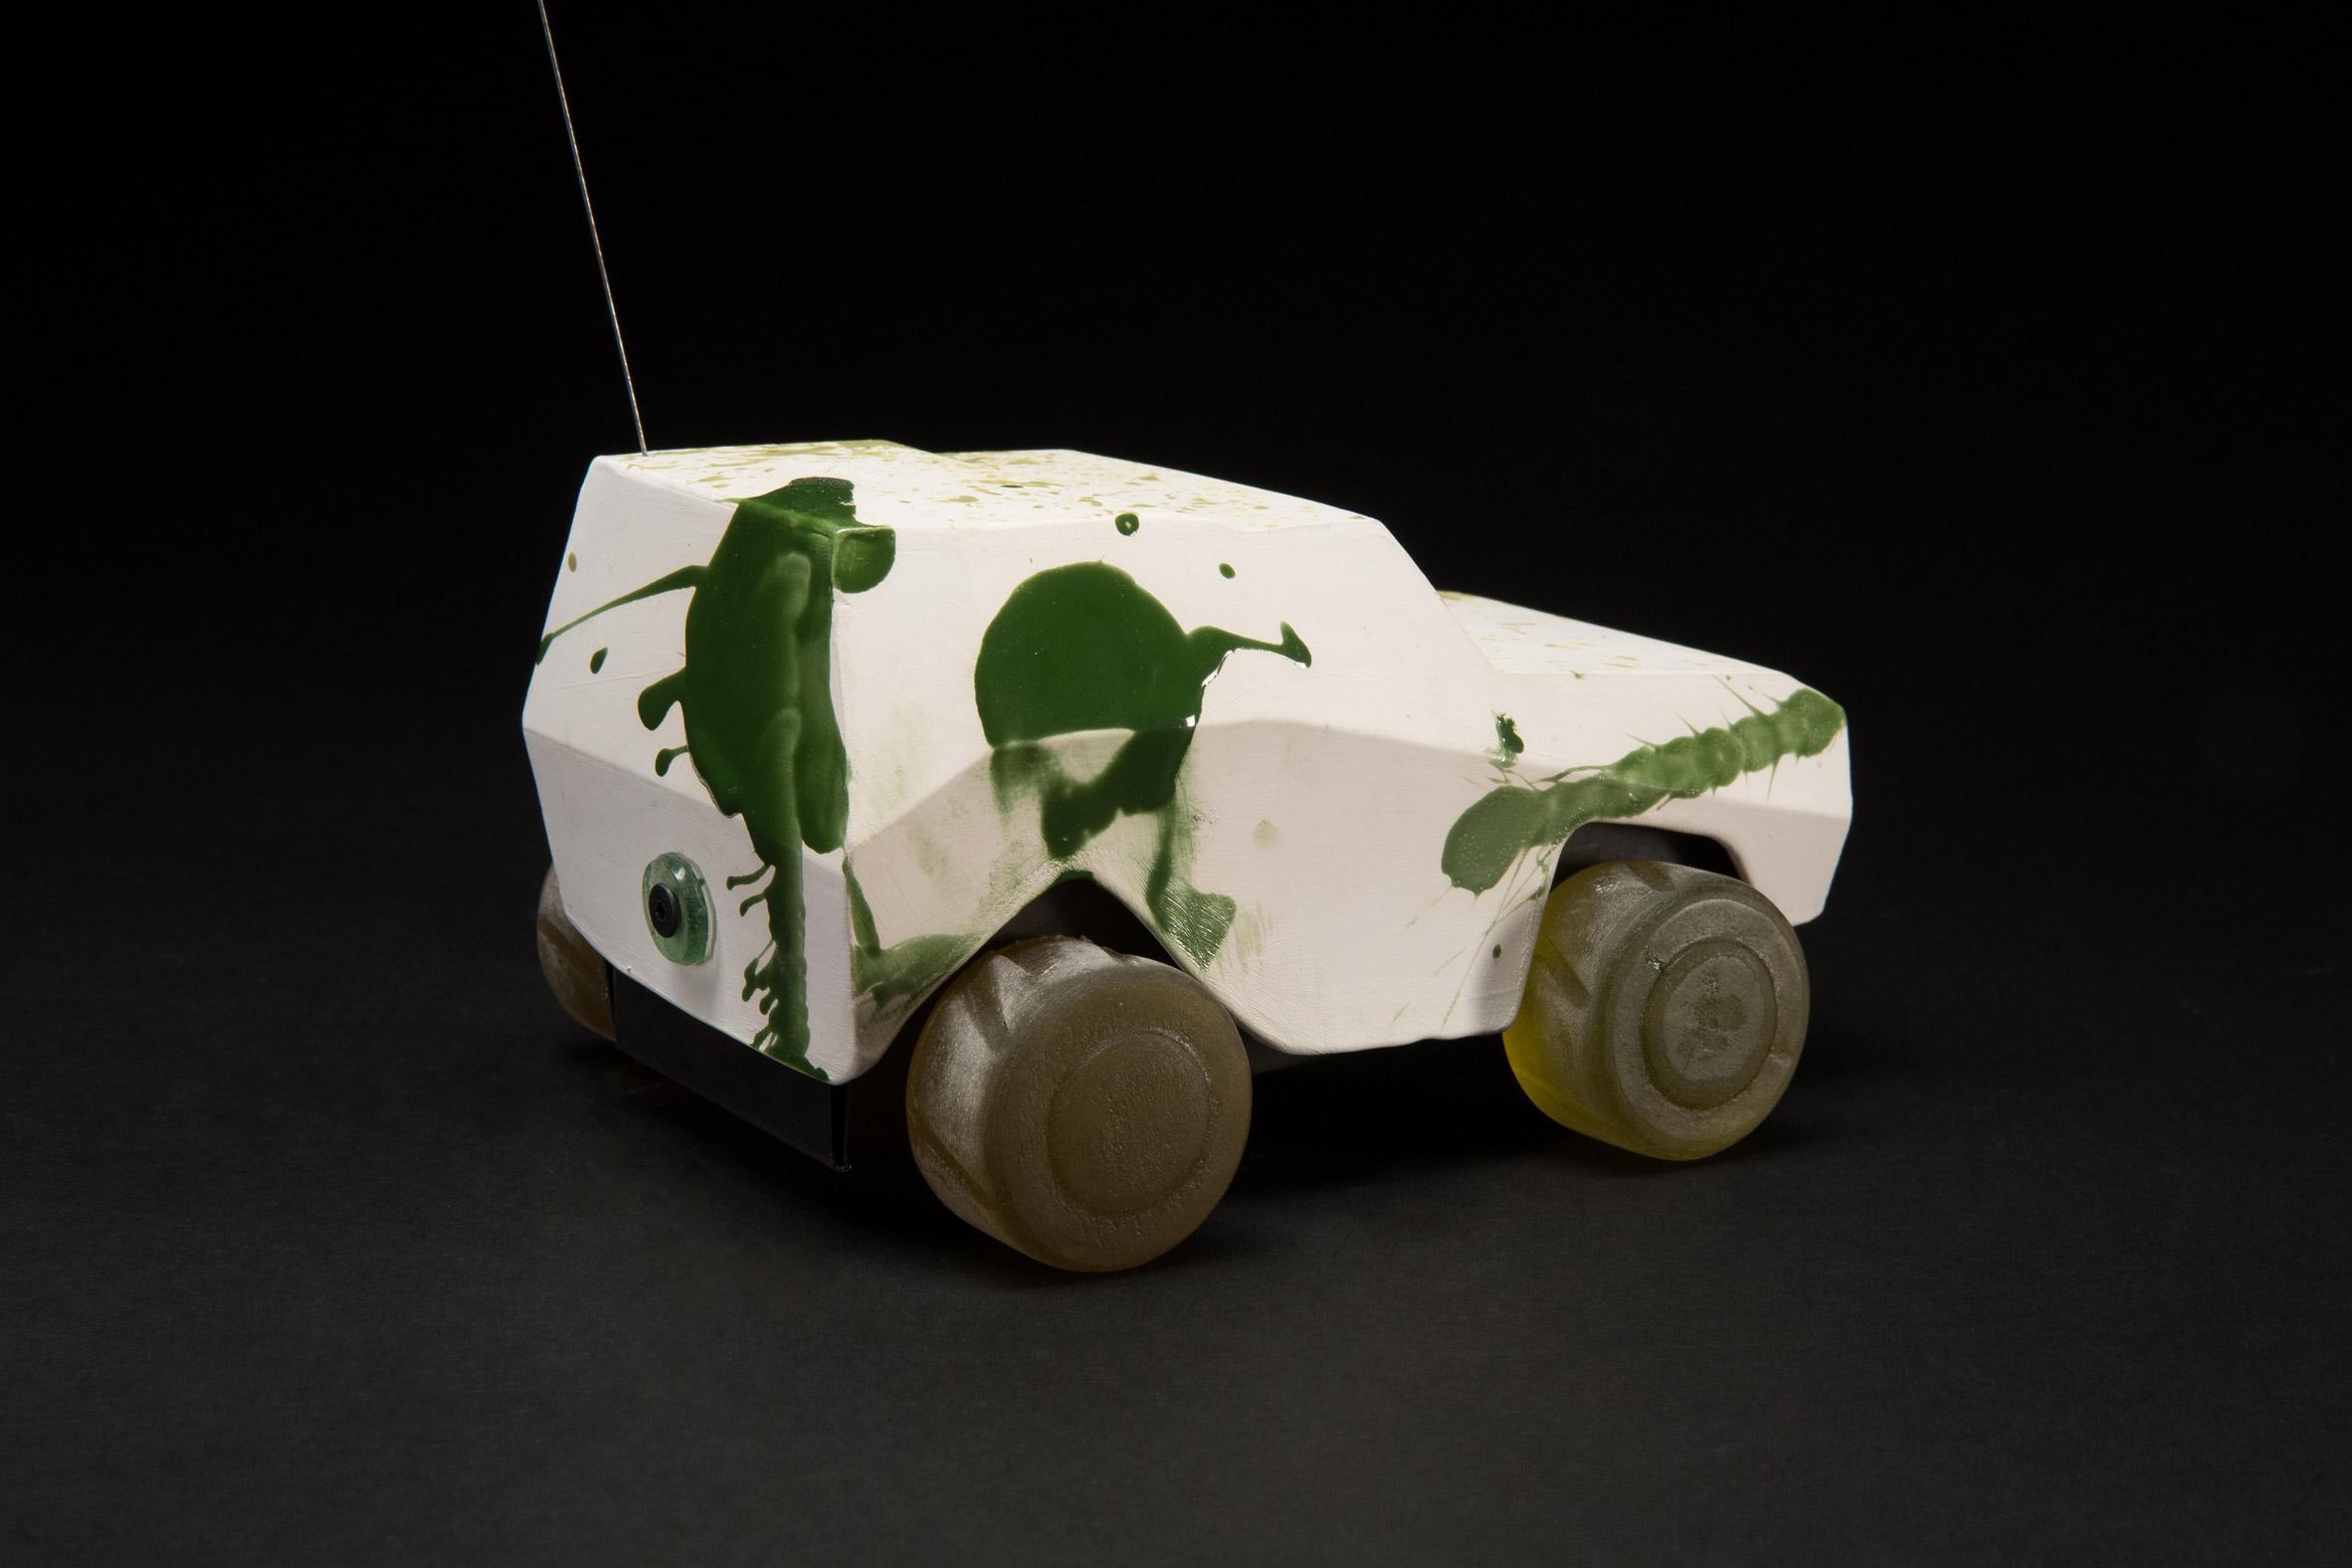 Oz Biri's ceramic military vehicles symbolise the